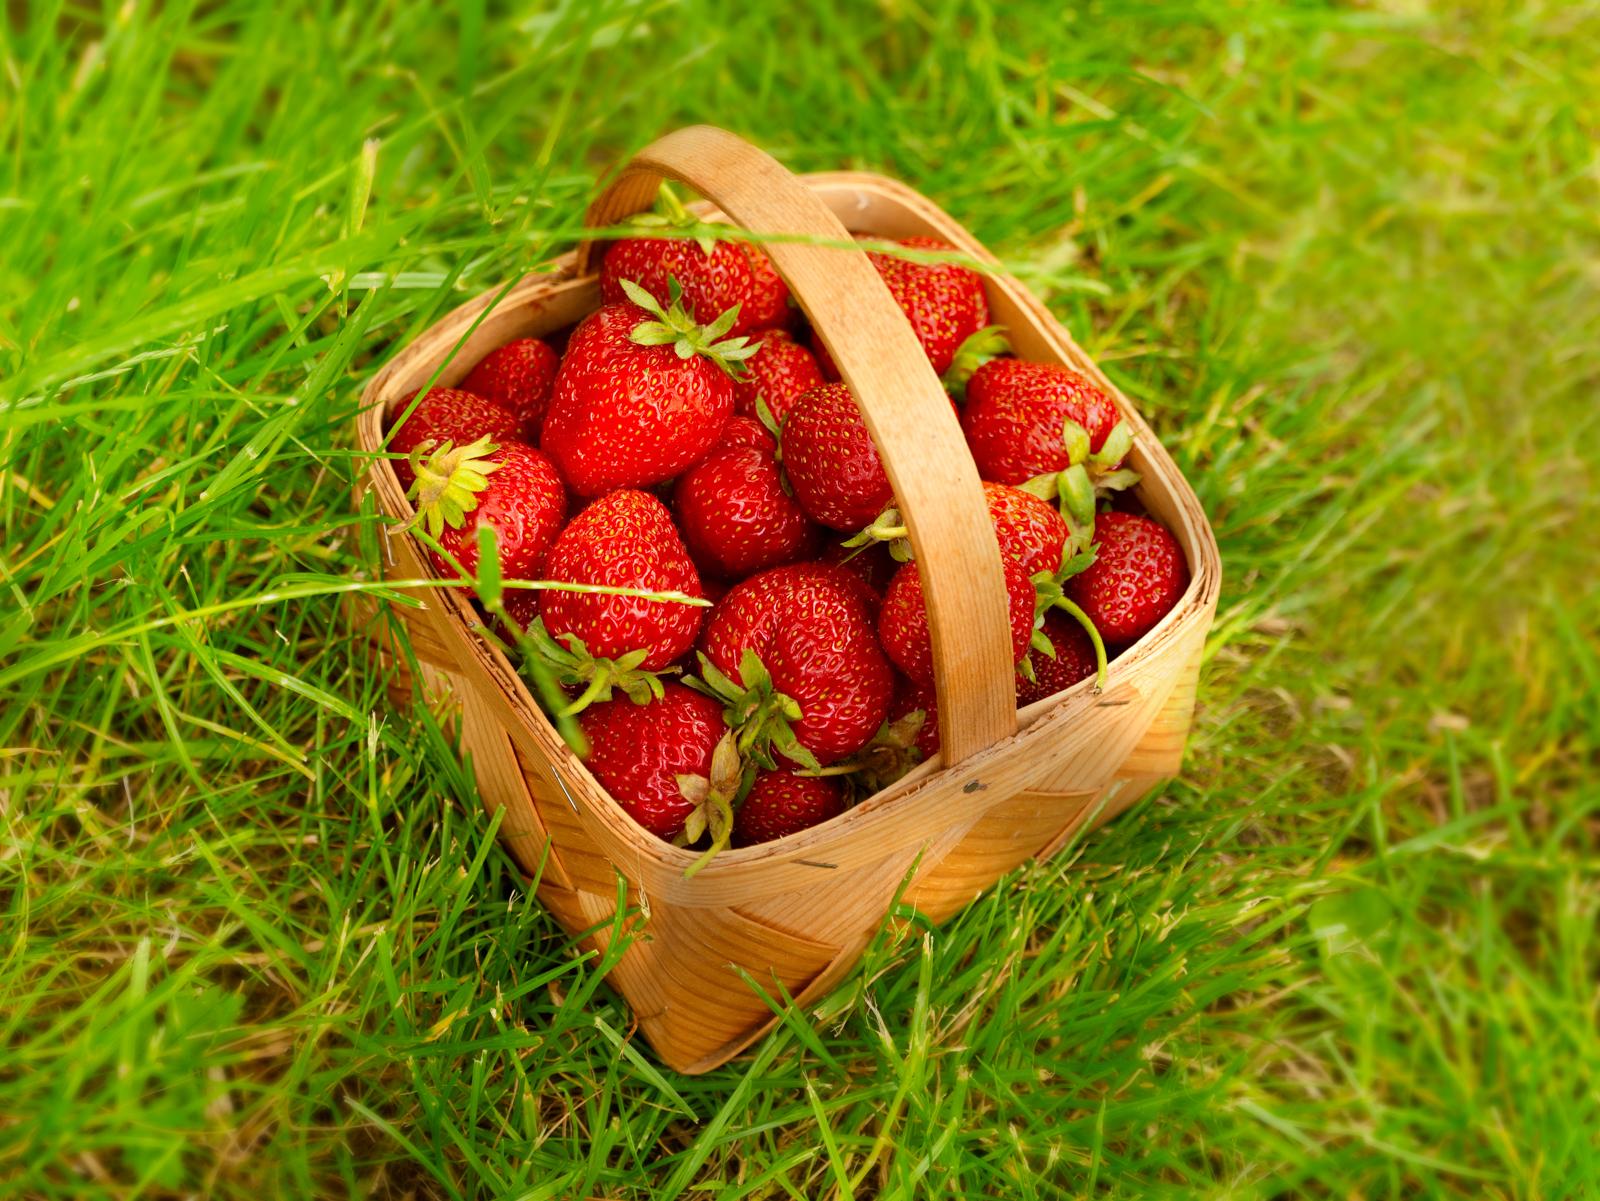 madhimlen_strawberry_007.jpg